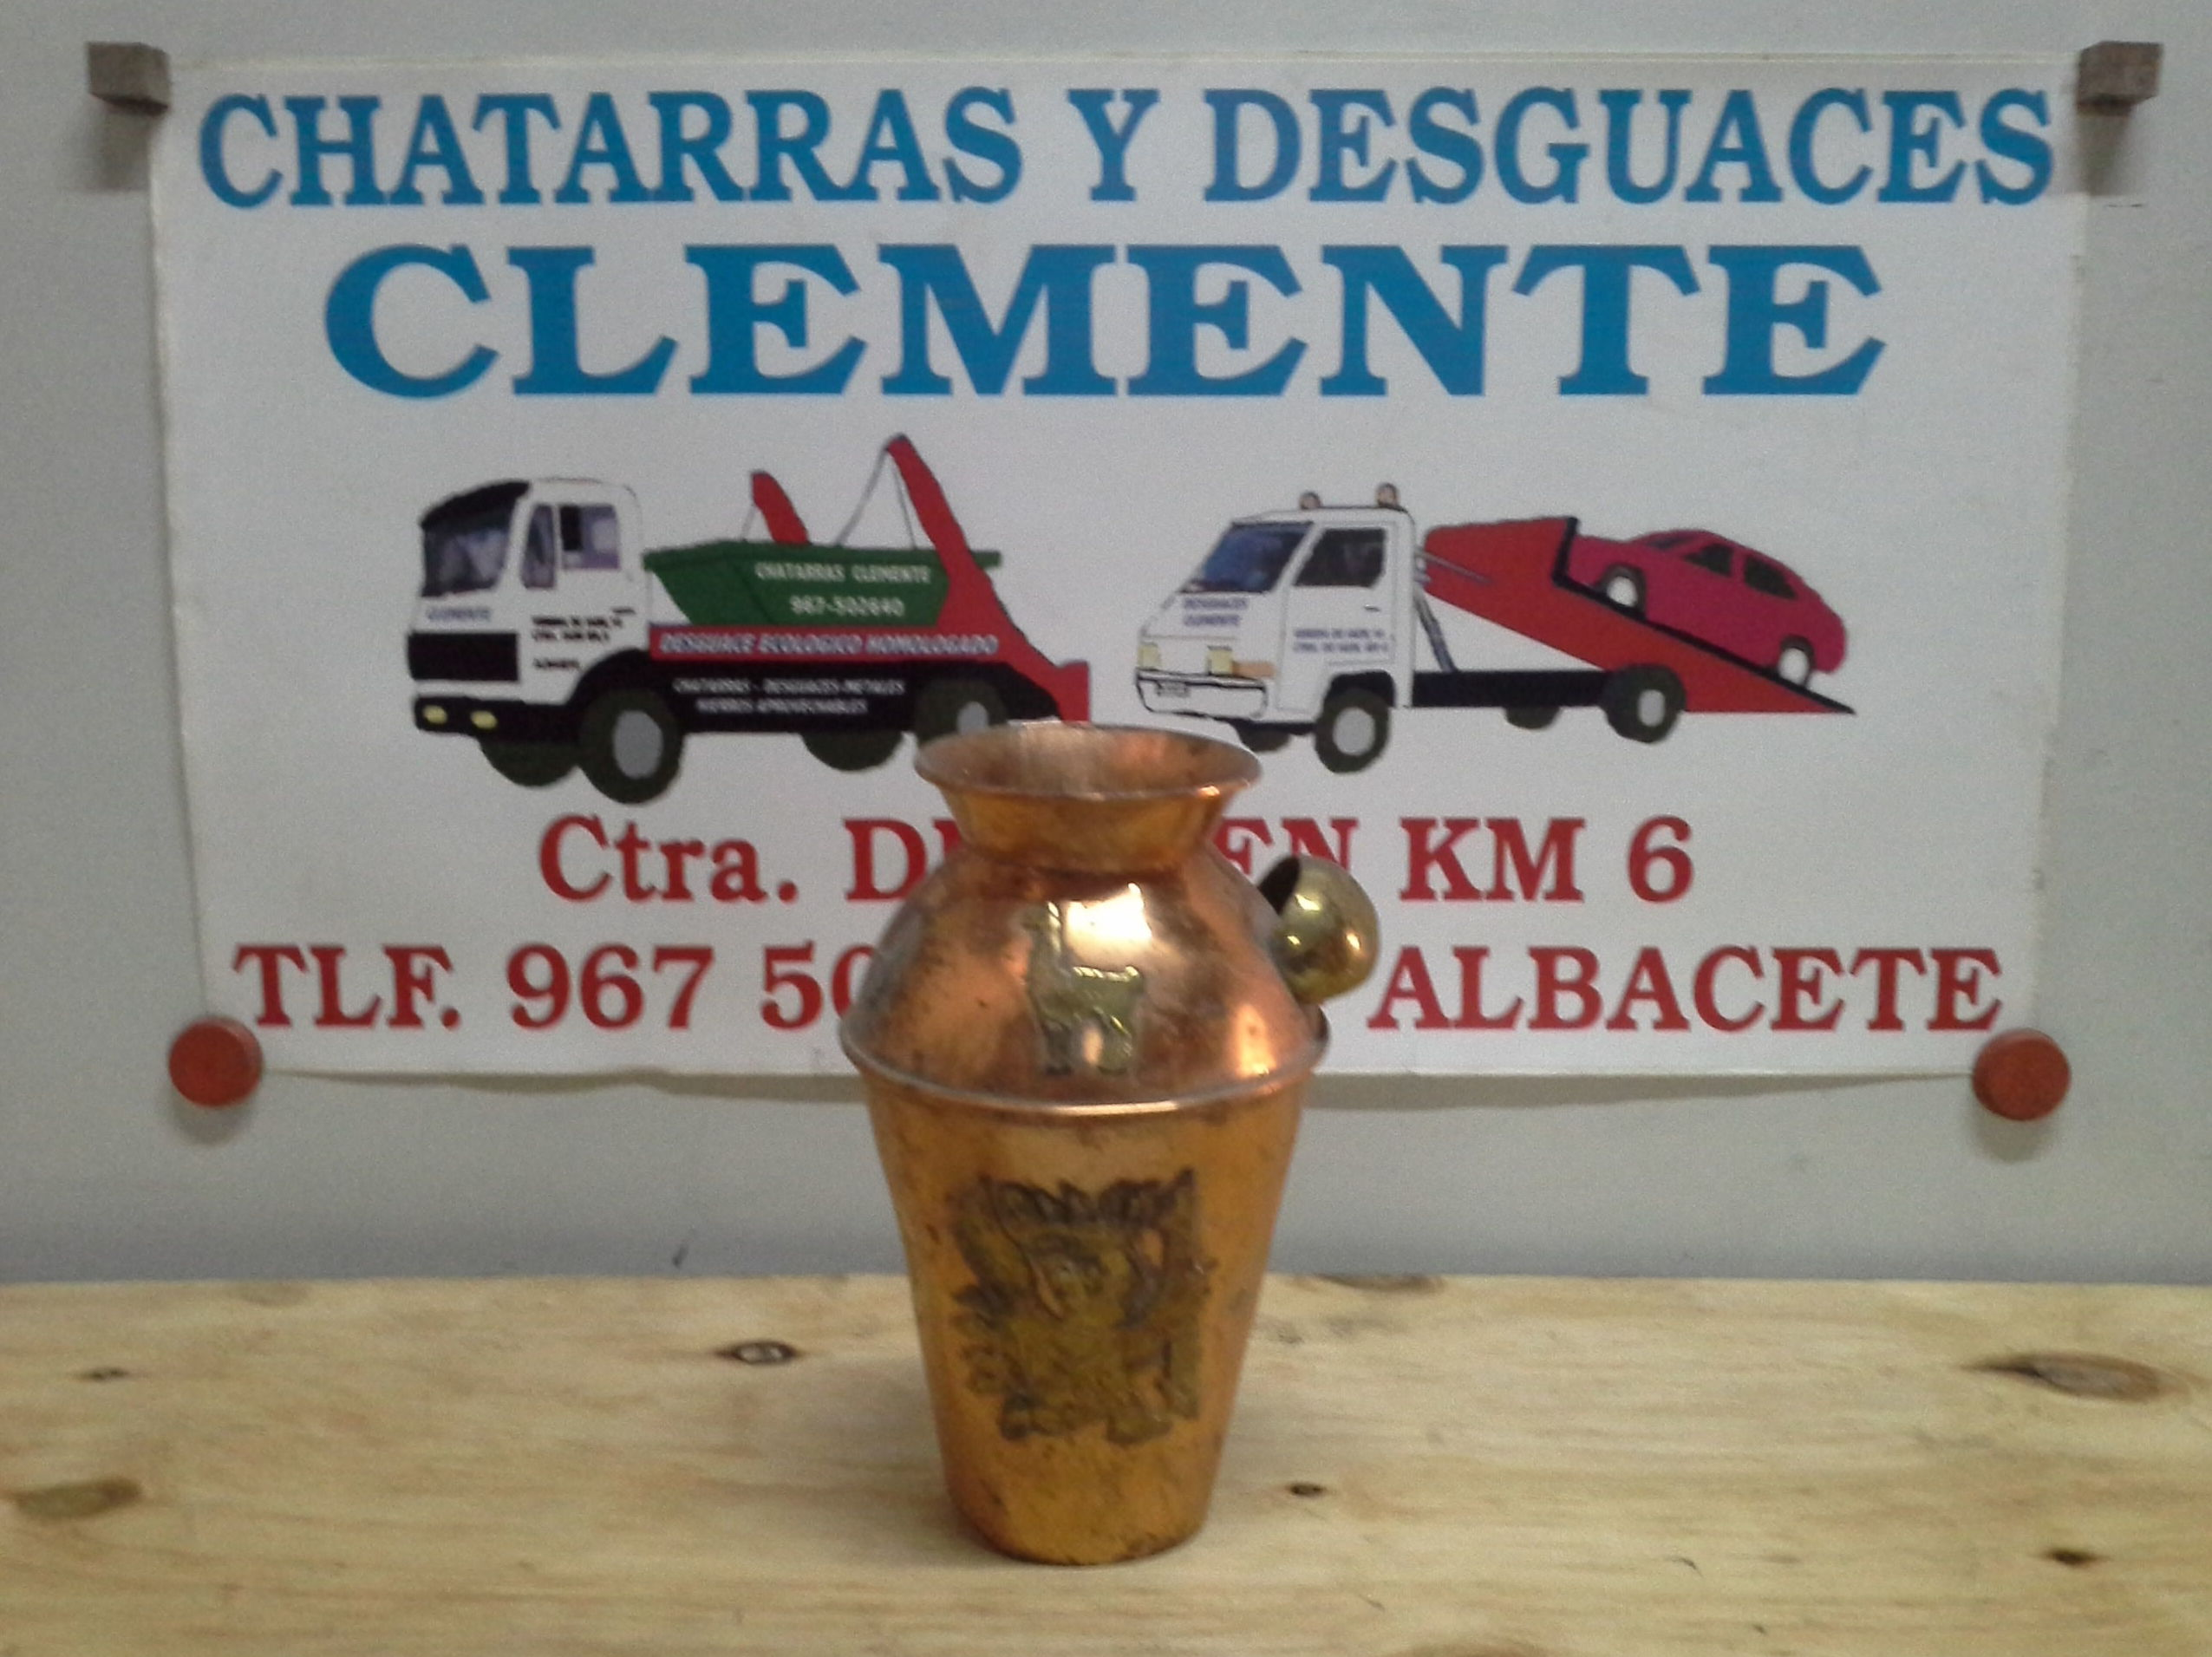 Vasija de cobre con detallss en laton en desguaces clemente de Albacete